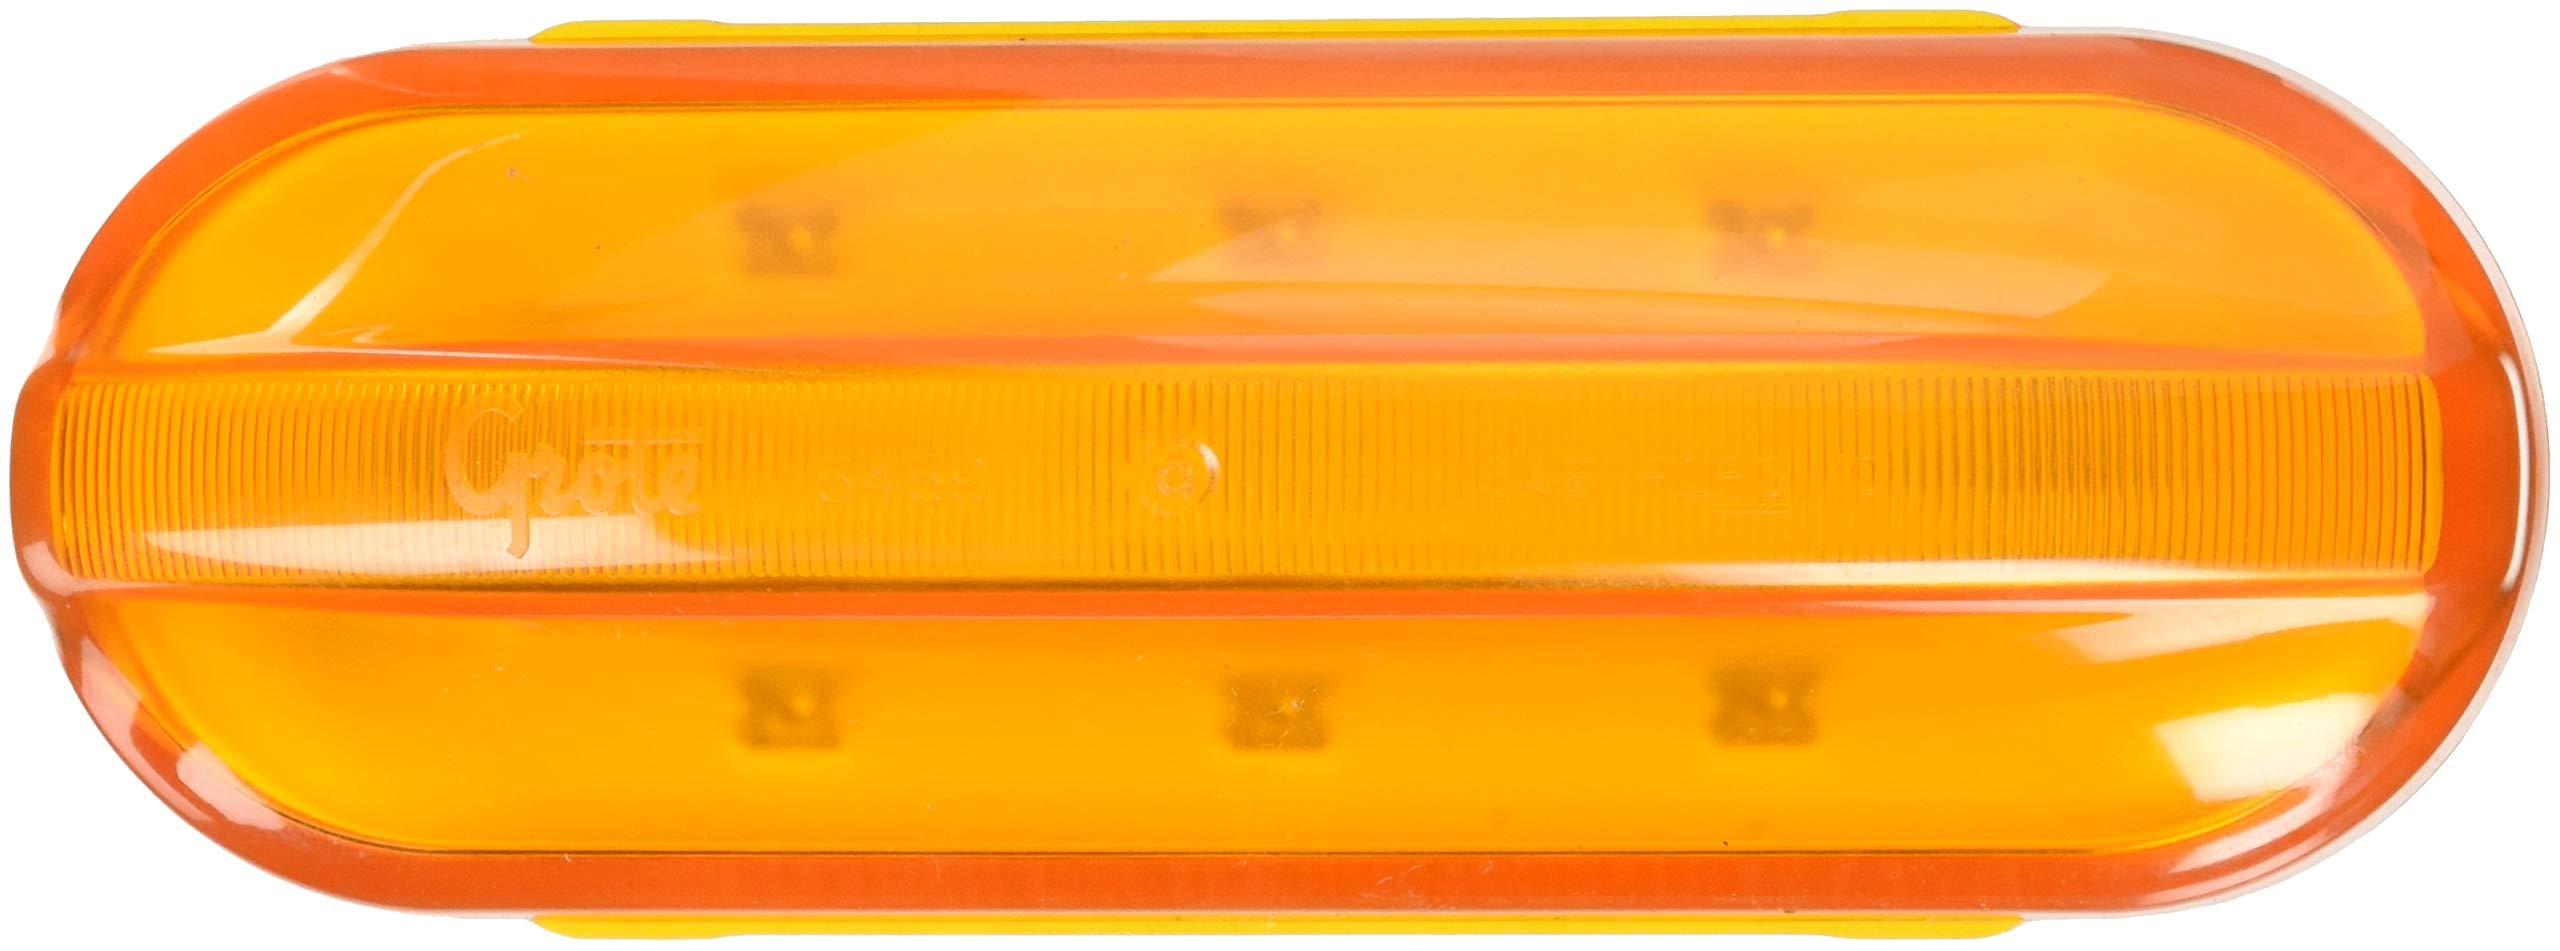 Grote 54593 Yellow RazorBack Mid-Position Flashing LED Marker Light